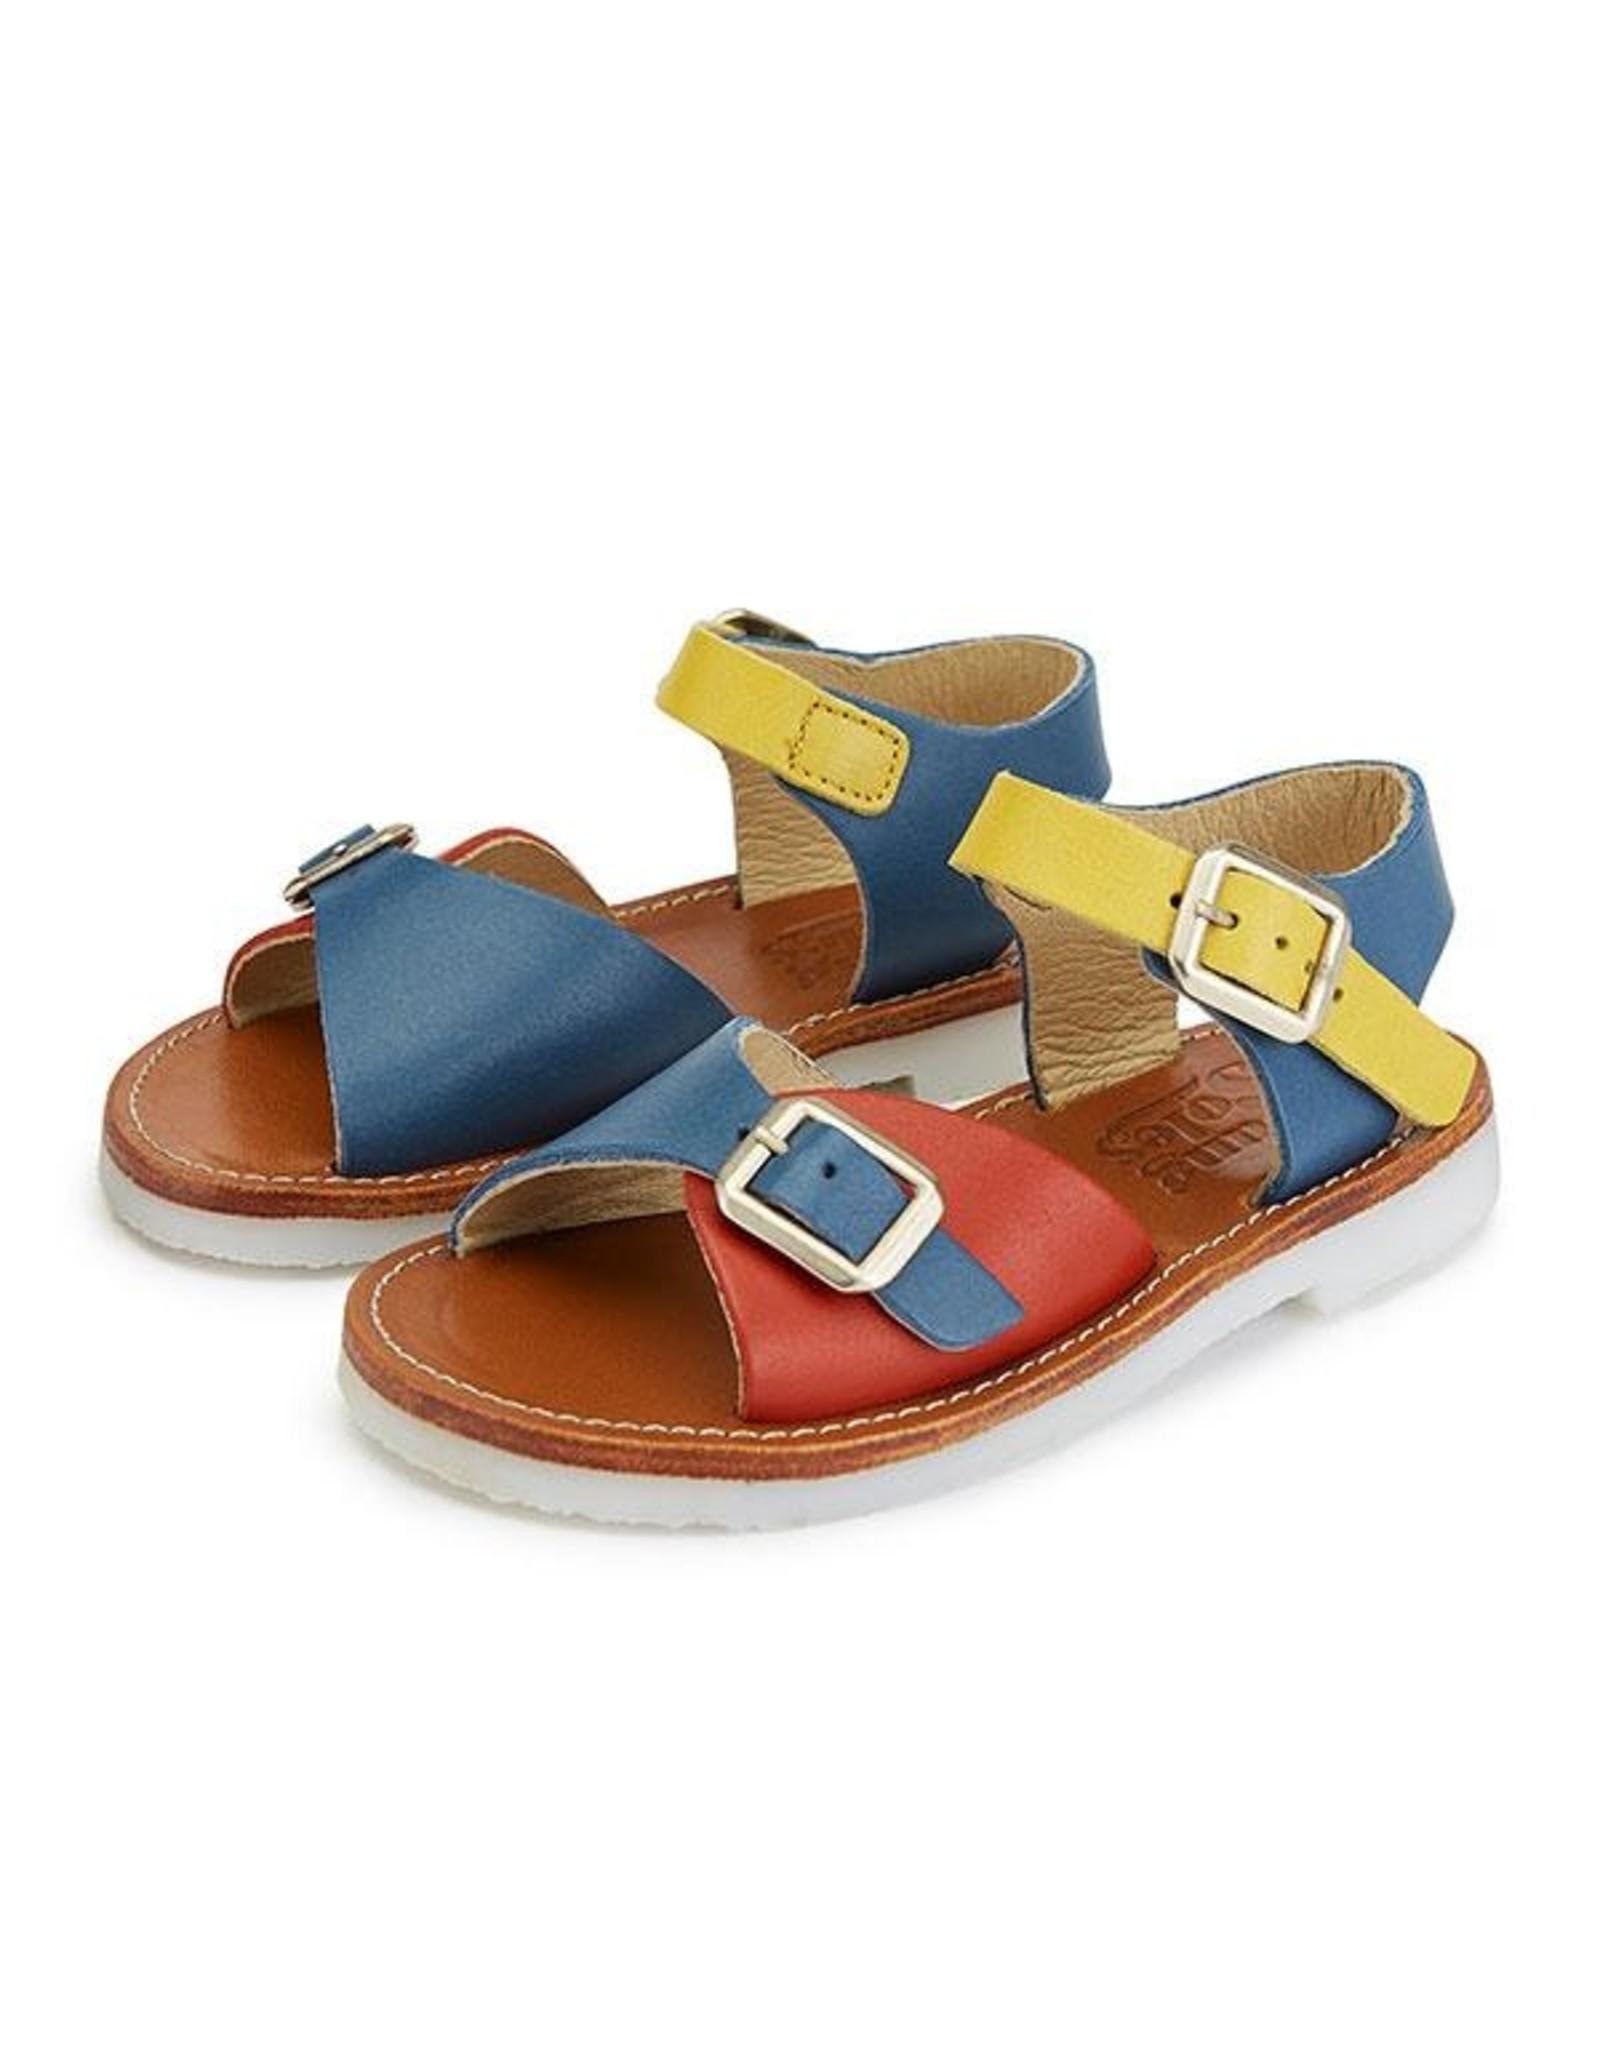 Young Soles Sonny sandal retro multi block